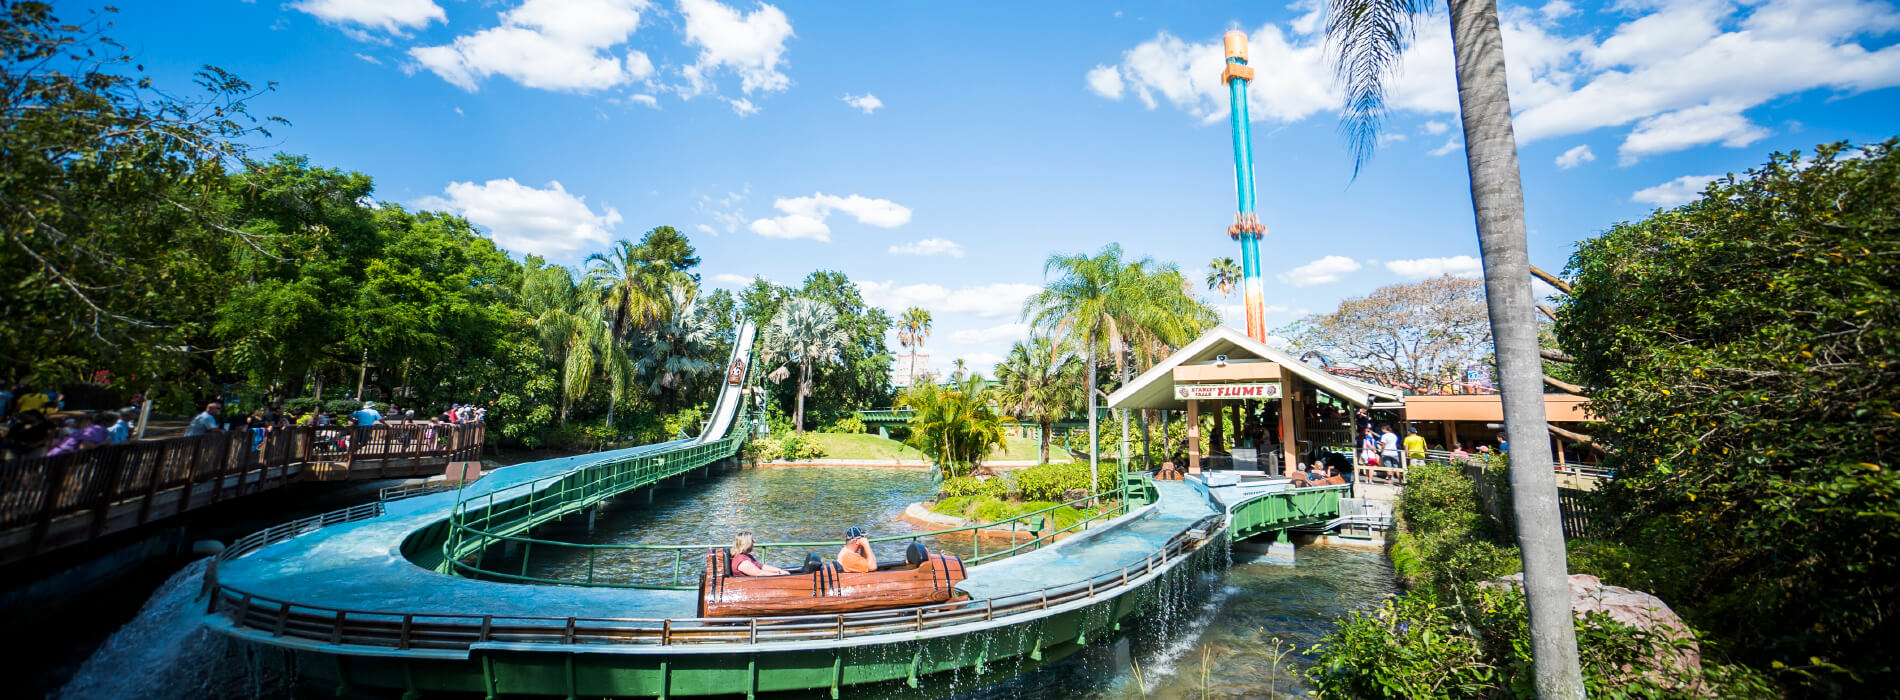 Ride Stanley Falls at Busch Gardens Tampa Bay